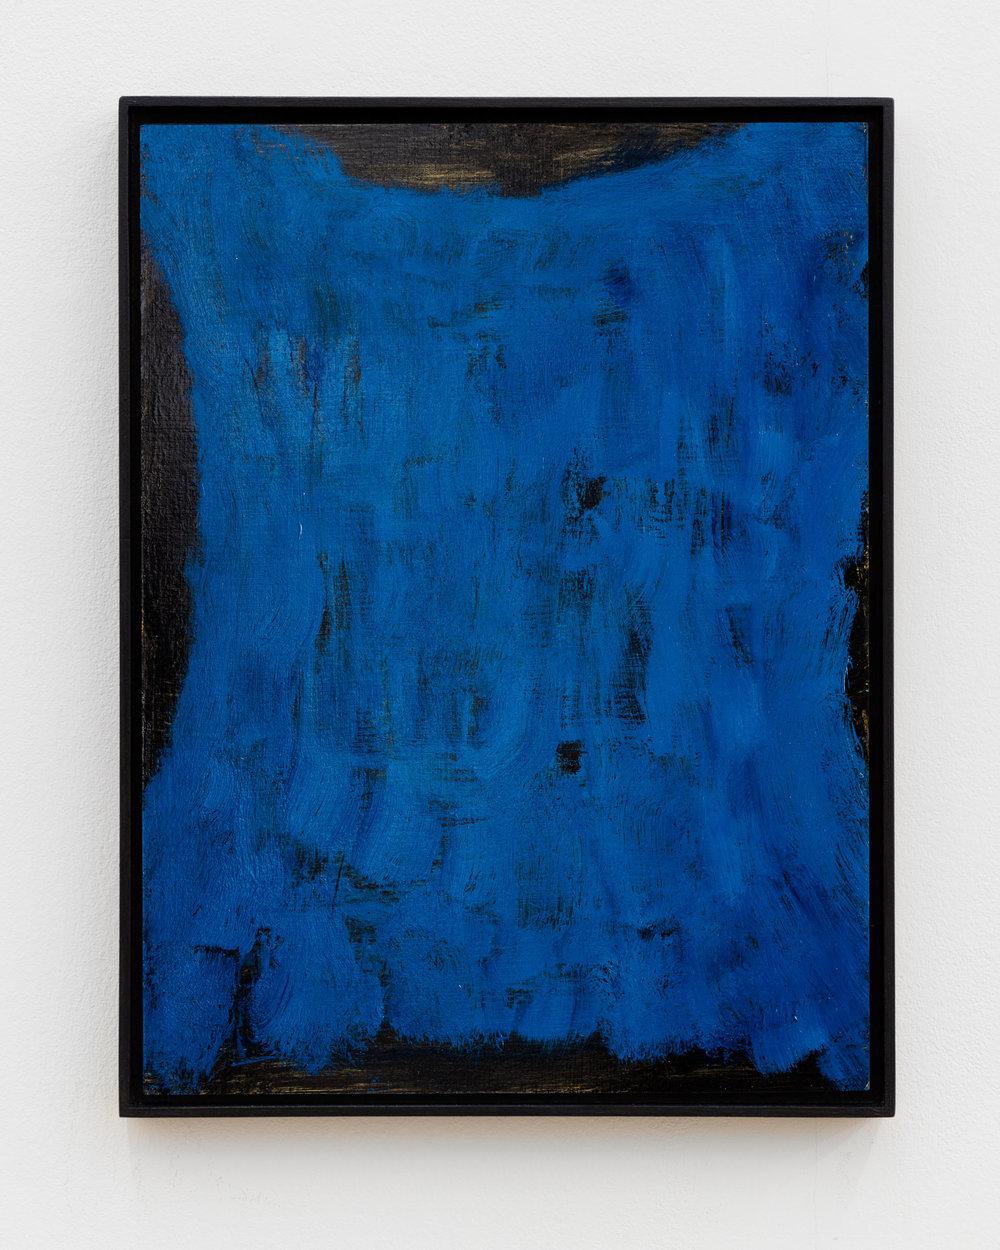 Veronika Hilger: Untitled, 2018, oil on paper on MDF in artists frame, 39,7 x 29,8 cm